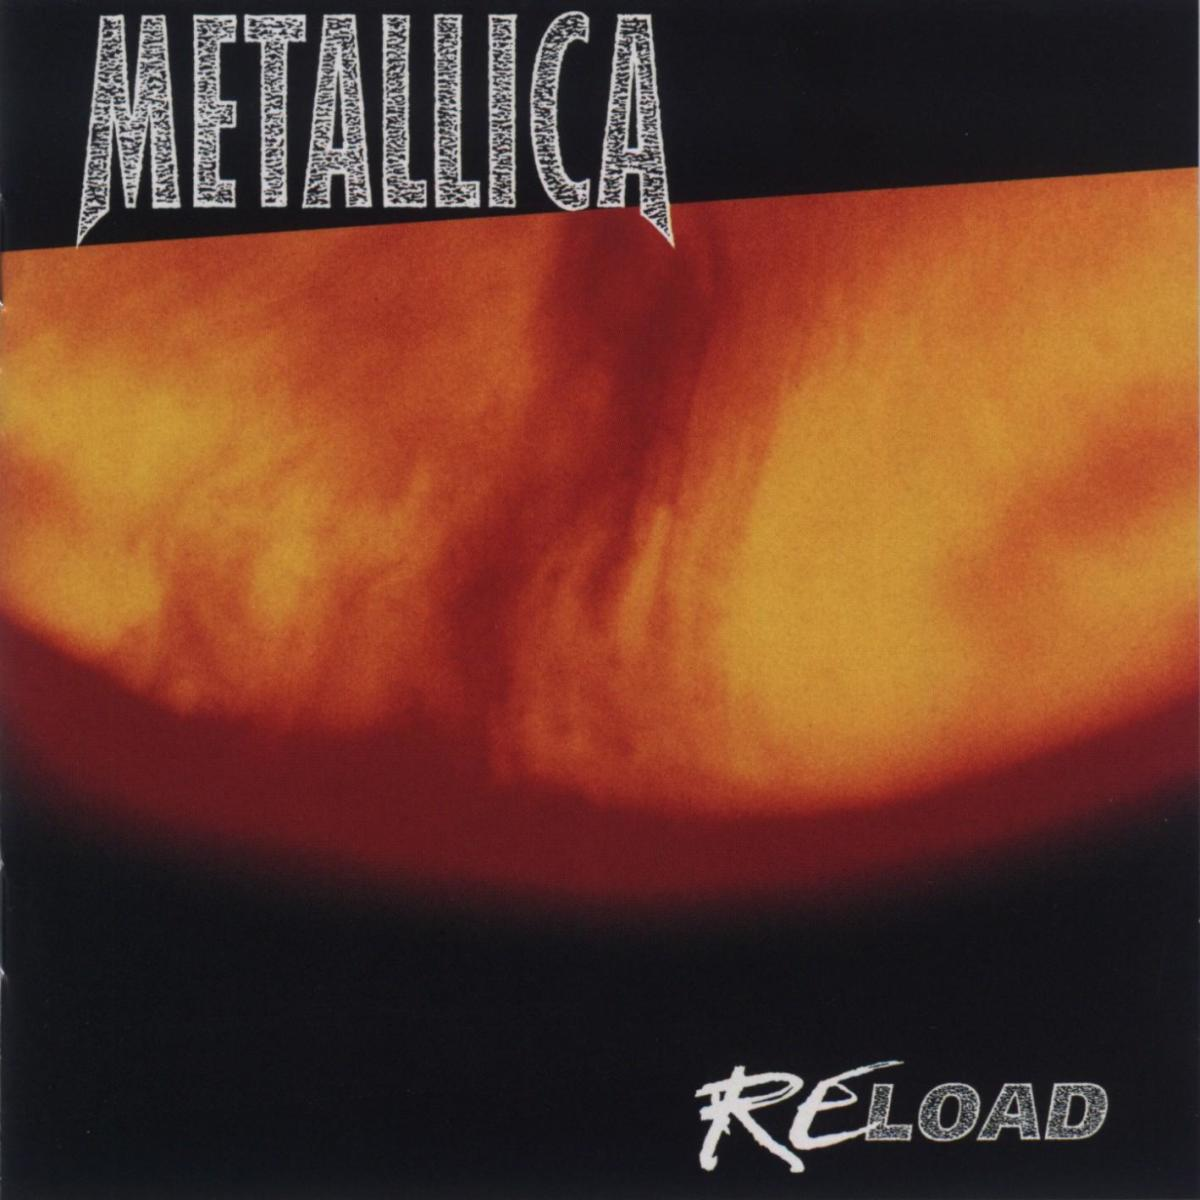 a-review-of-a-forgotten-album-metallica-re-load